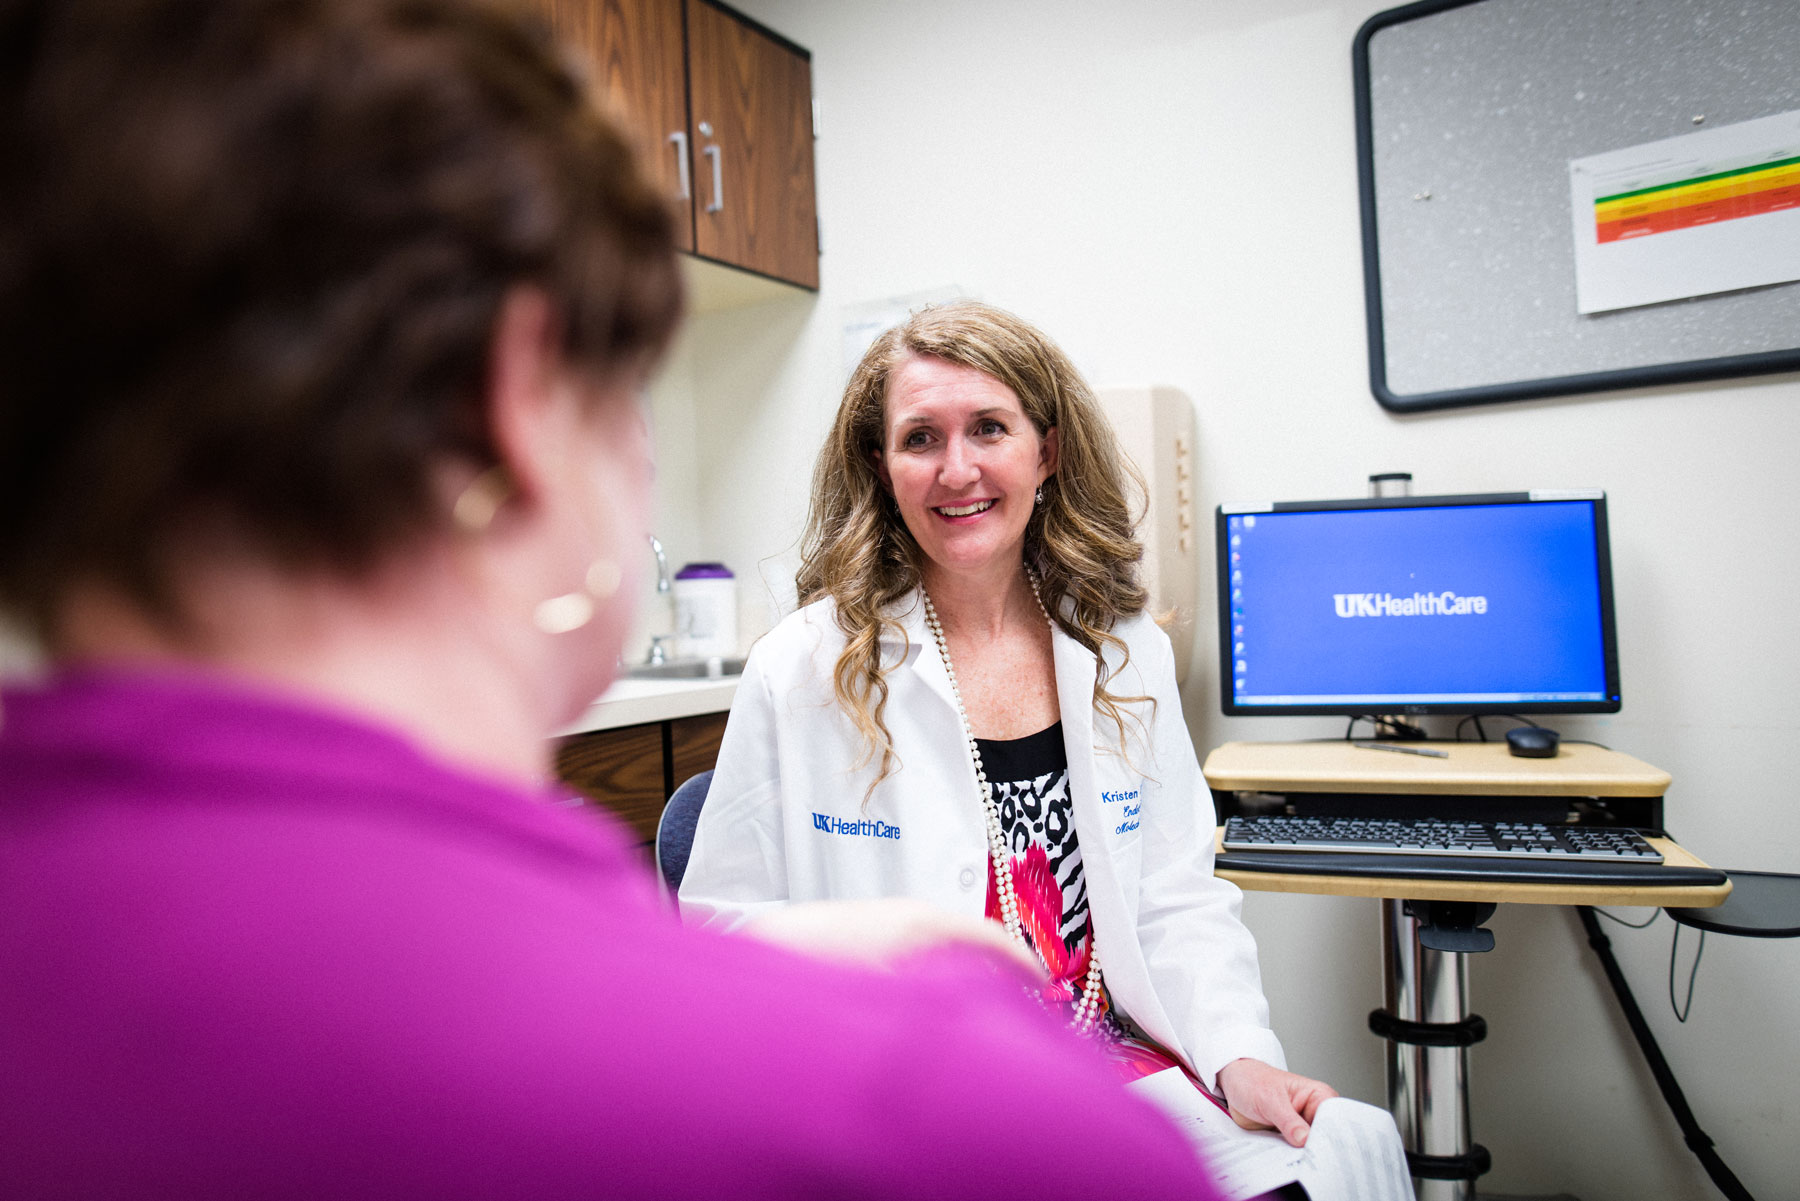 Dr. Kristen Stakelin talks to Teresa in an examination room.